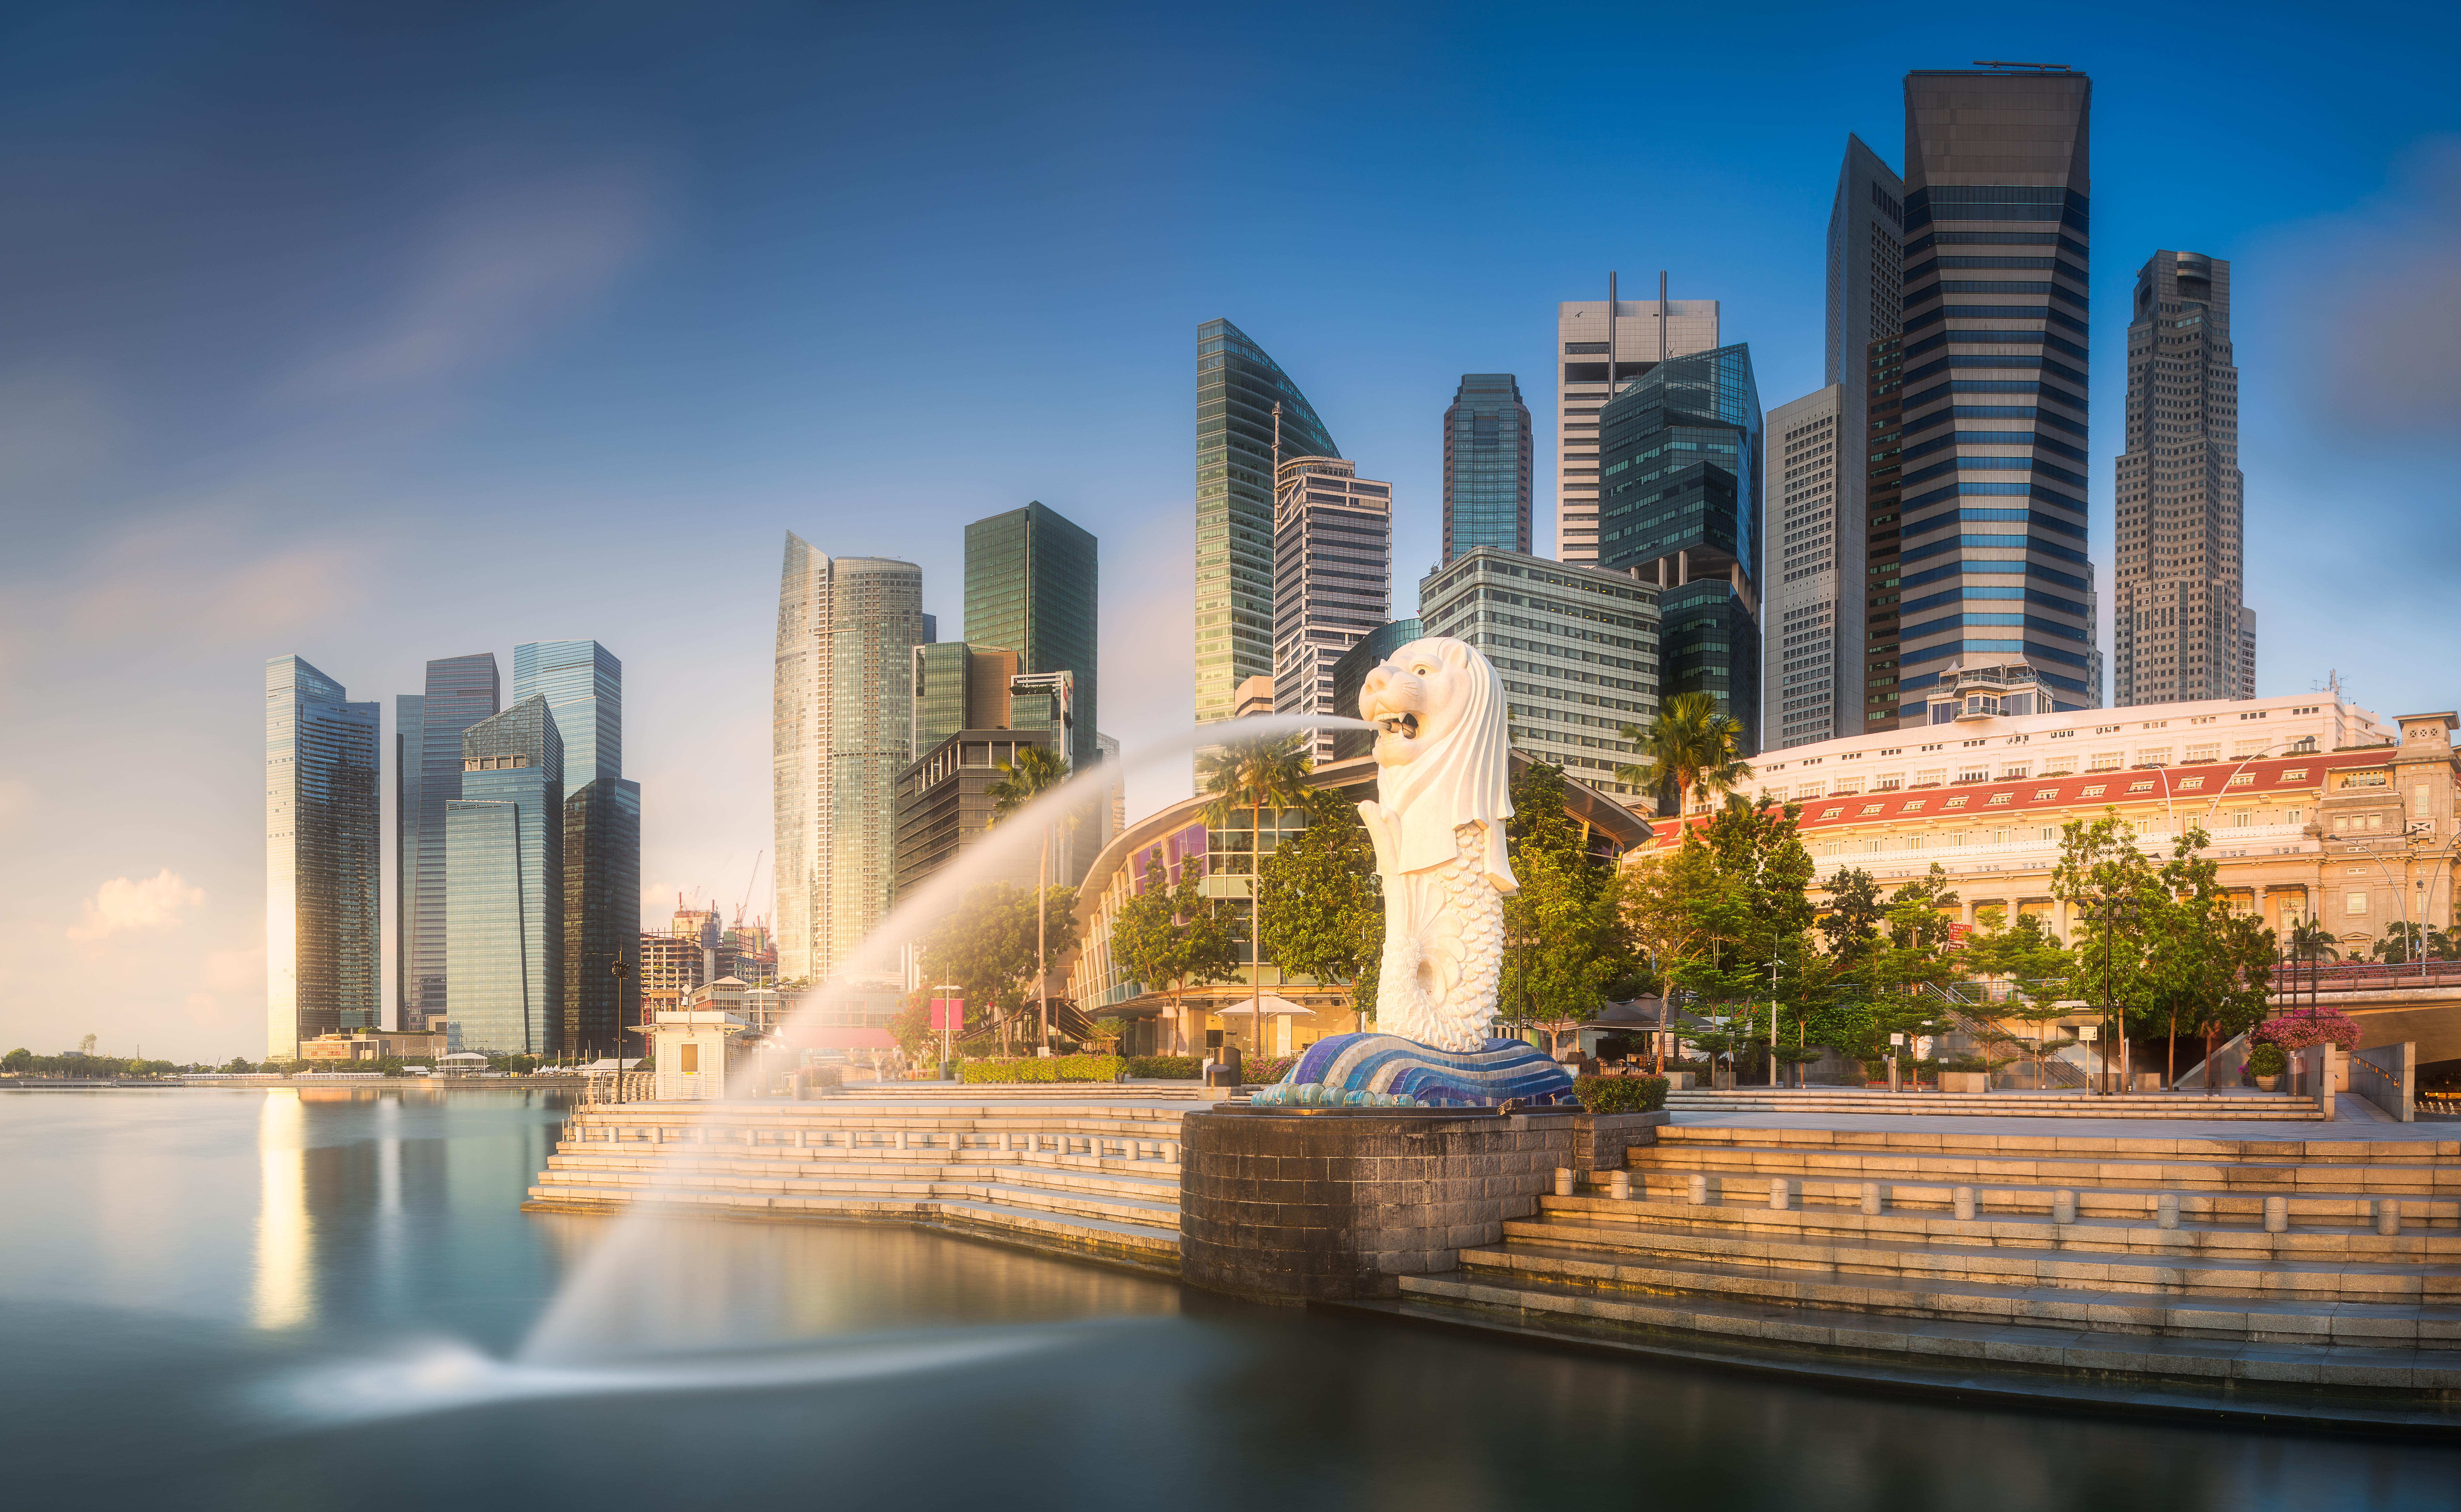 JPMorgan, DBS, and Temasek form new blockchain firm to improve cross-border payments